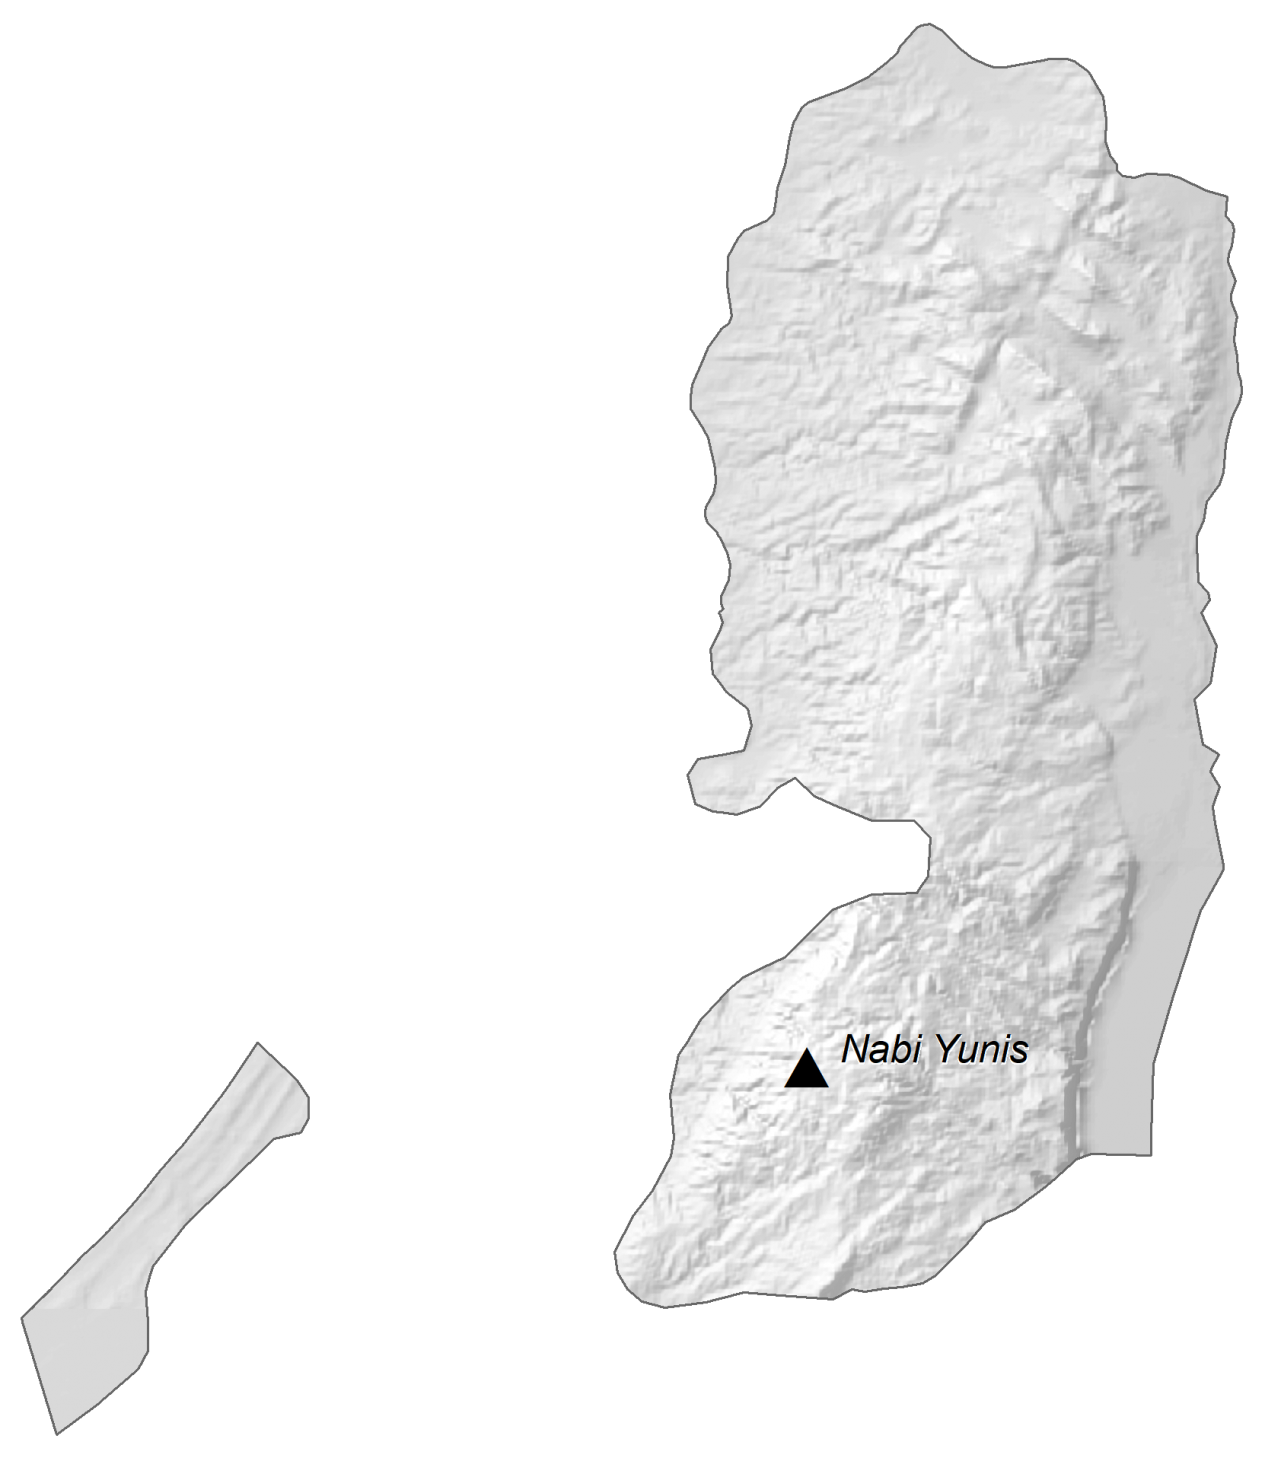 Palestine Elevation Map